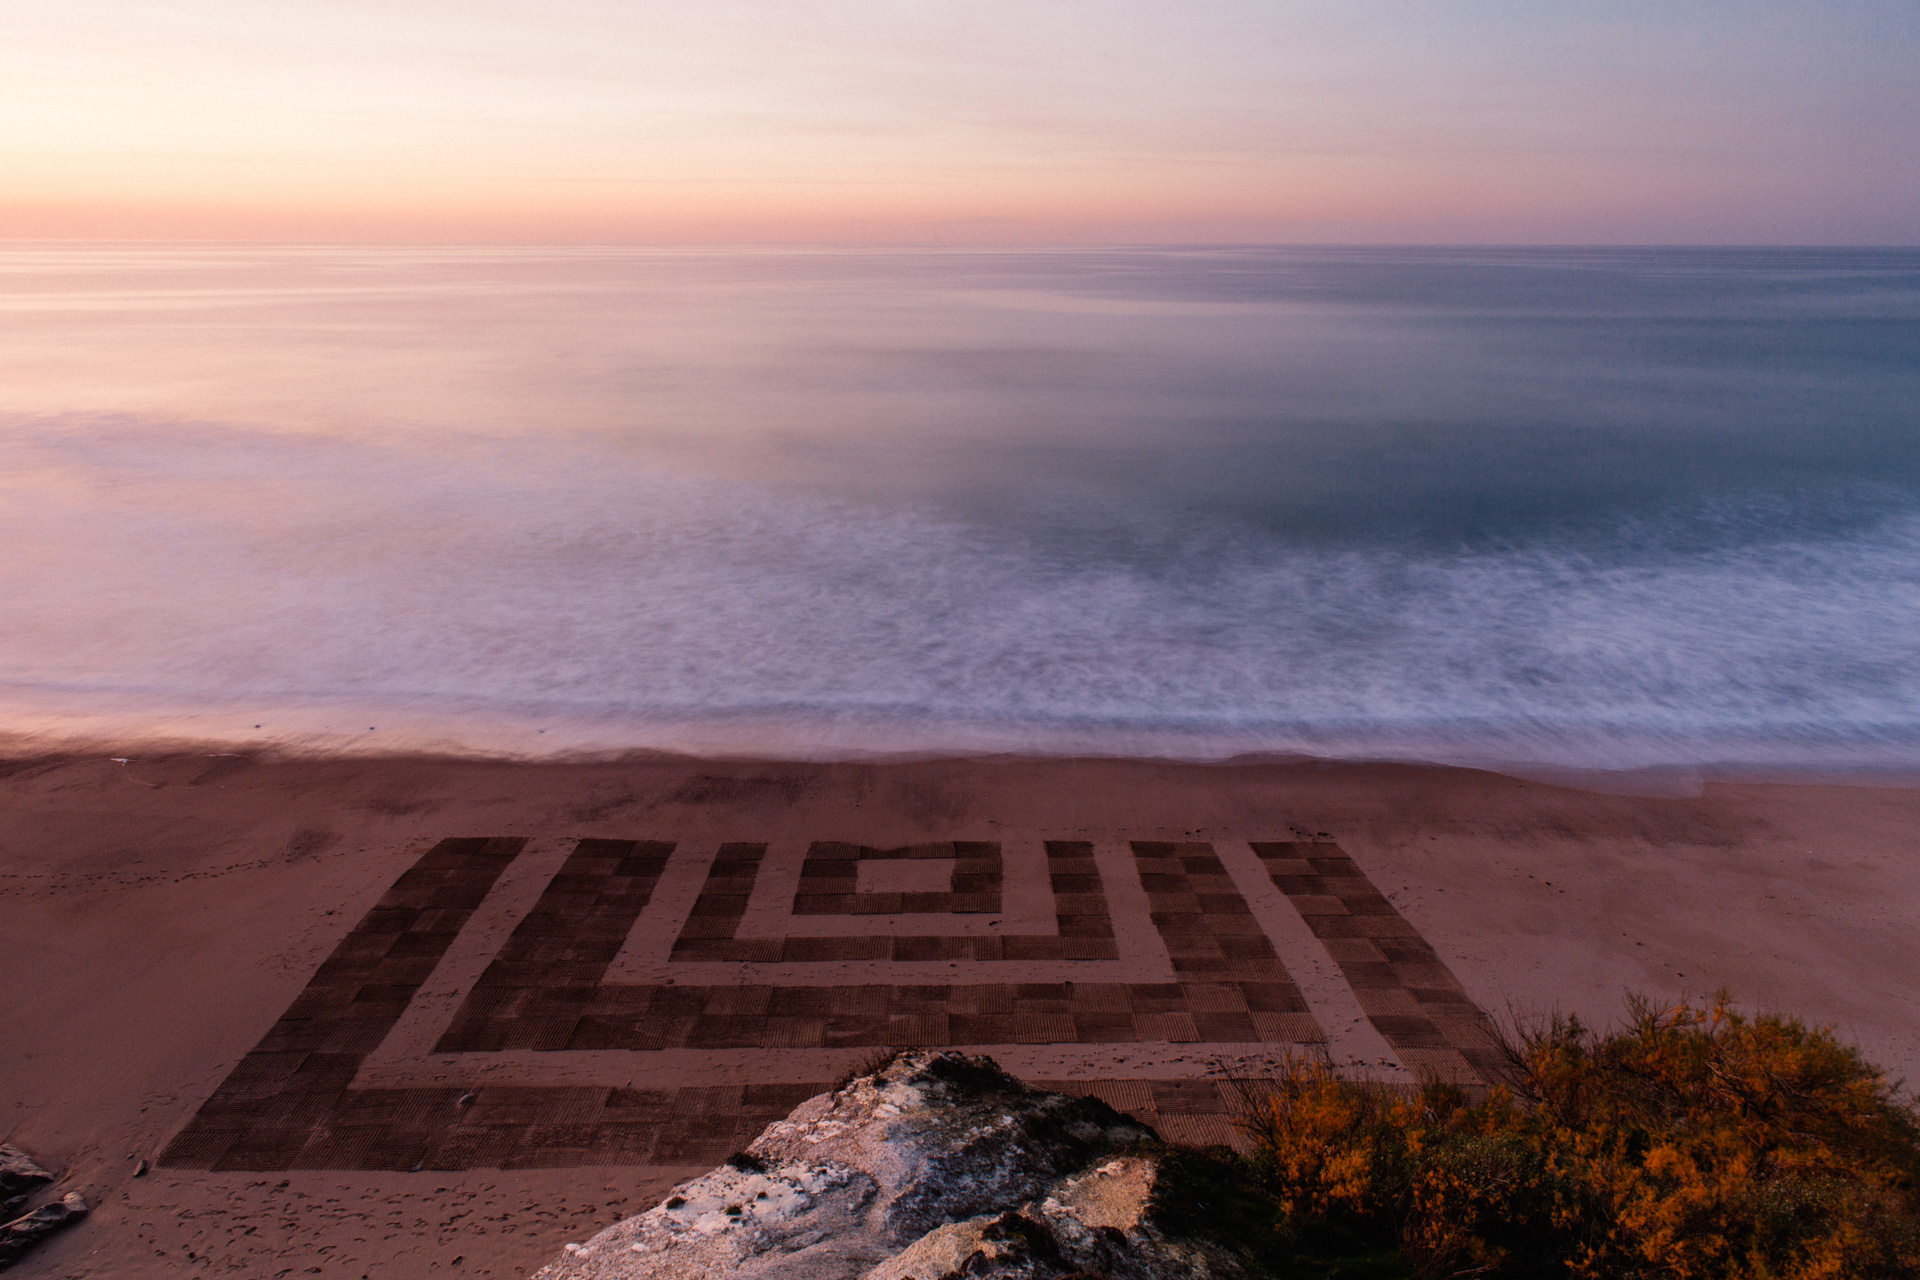 Damien-dohmen-sand-print-lx-one-9